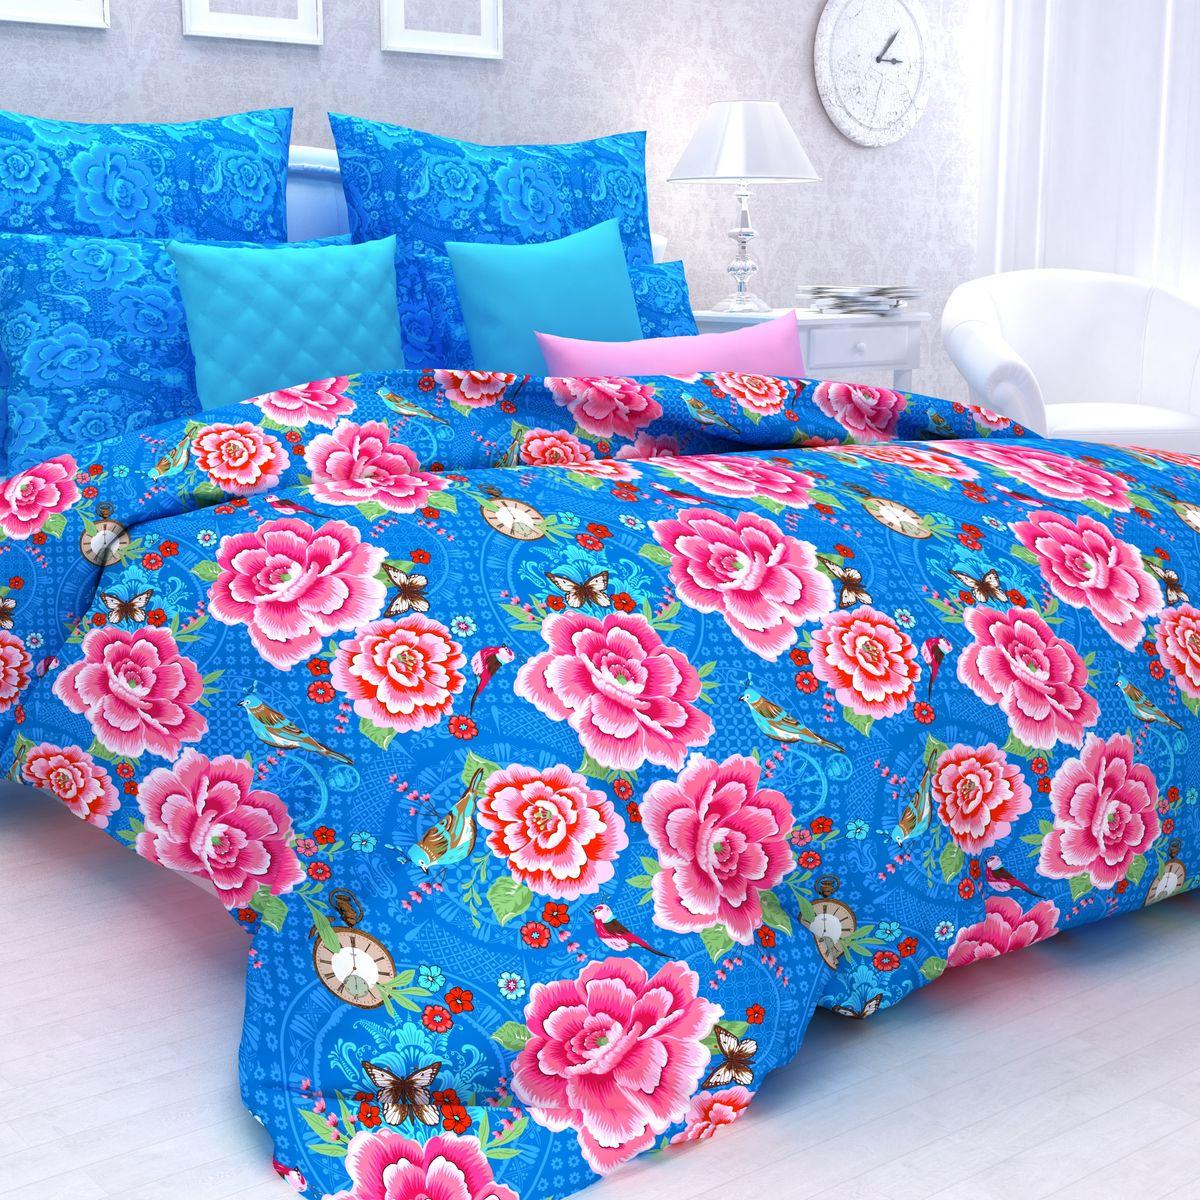 Комплект белья Унисон Василиса, 1,5 спальное, наволочки 70 x 70, цвет: синий. 232735232735